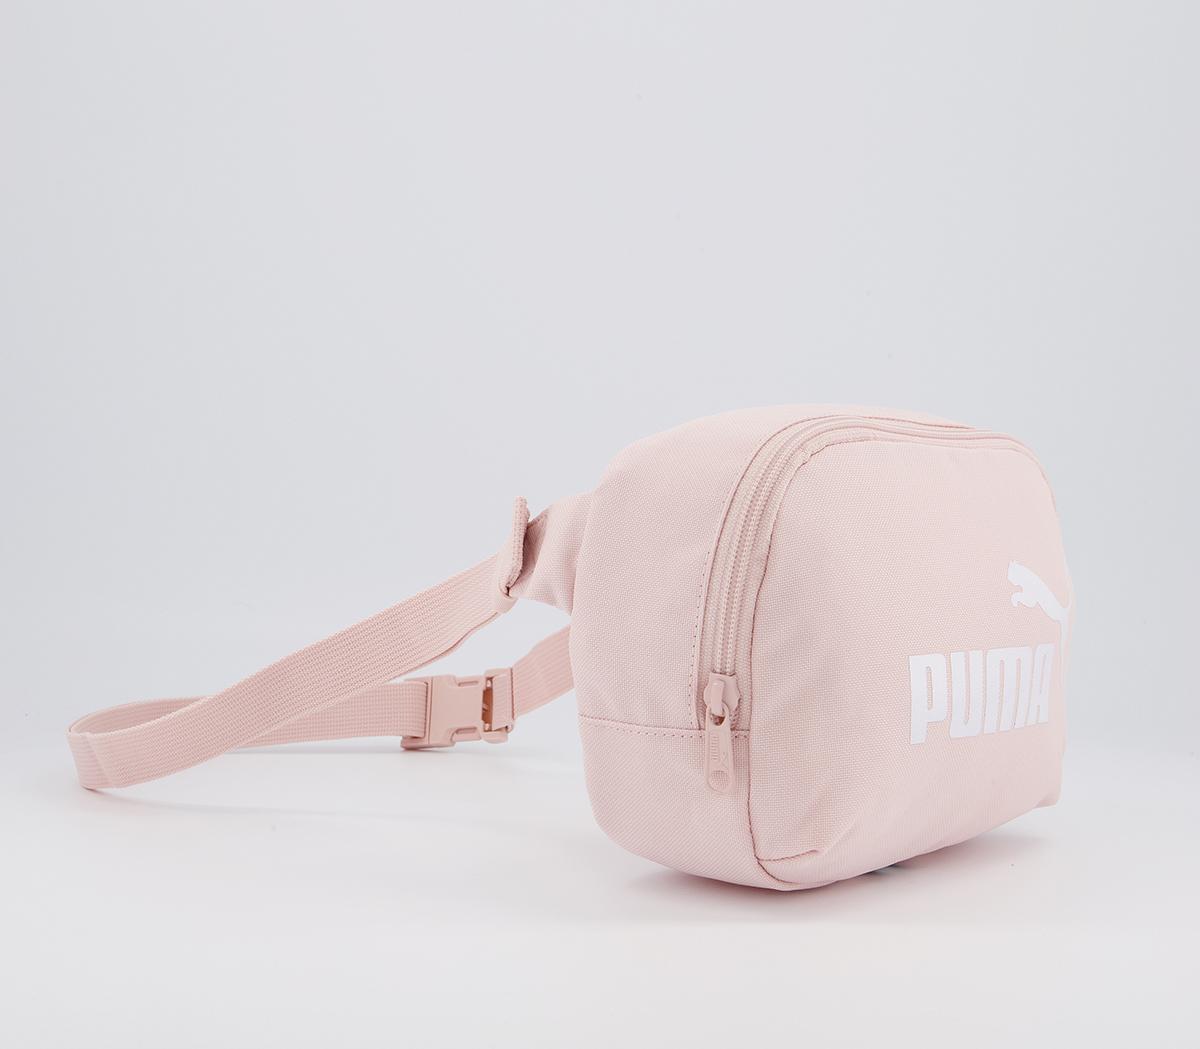 Phase Waist Bag